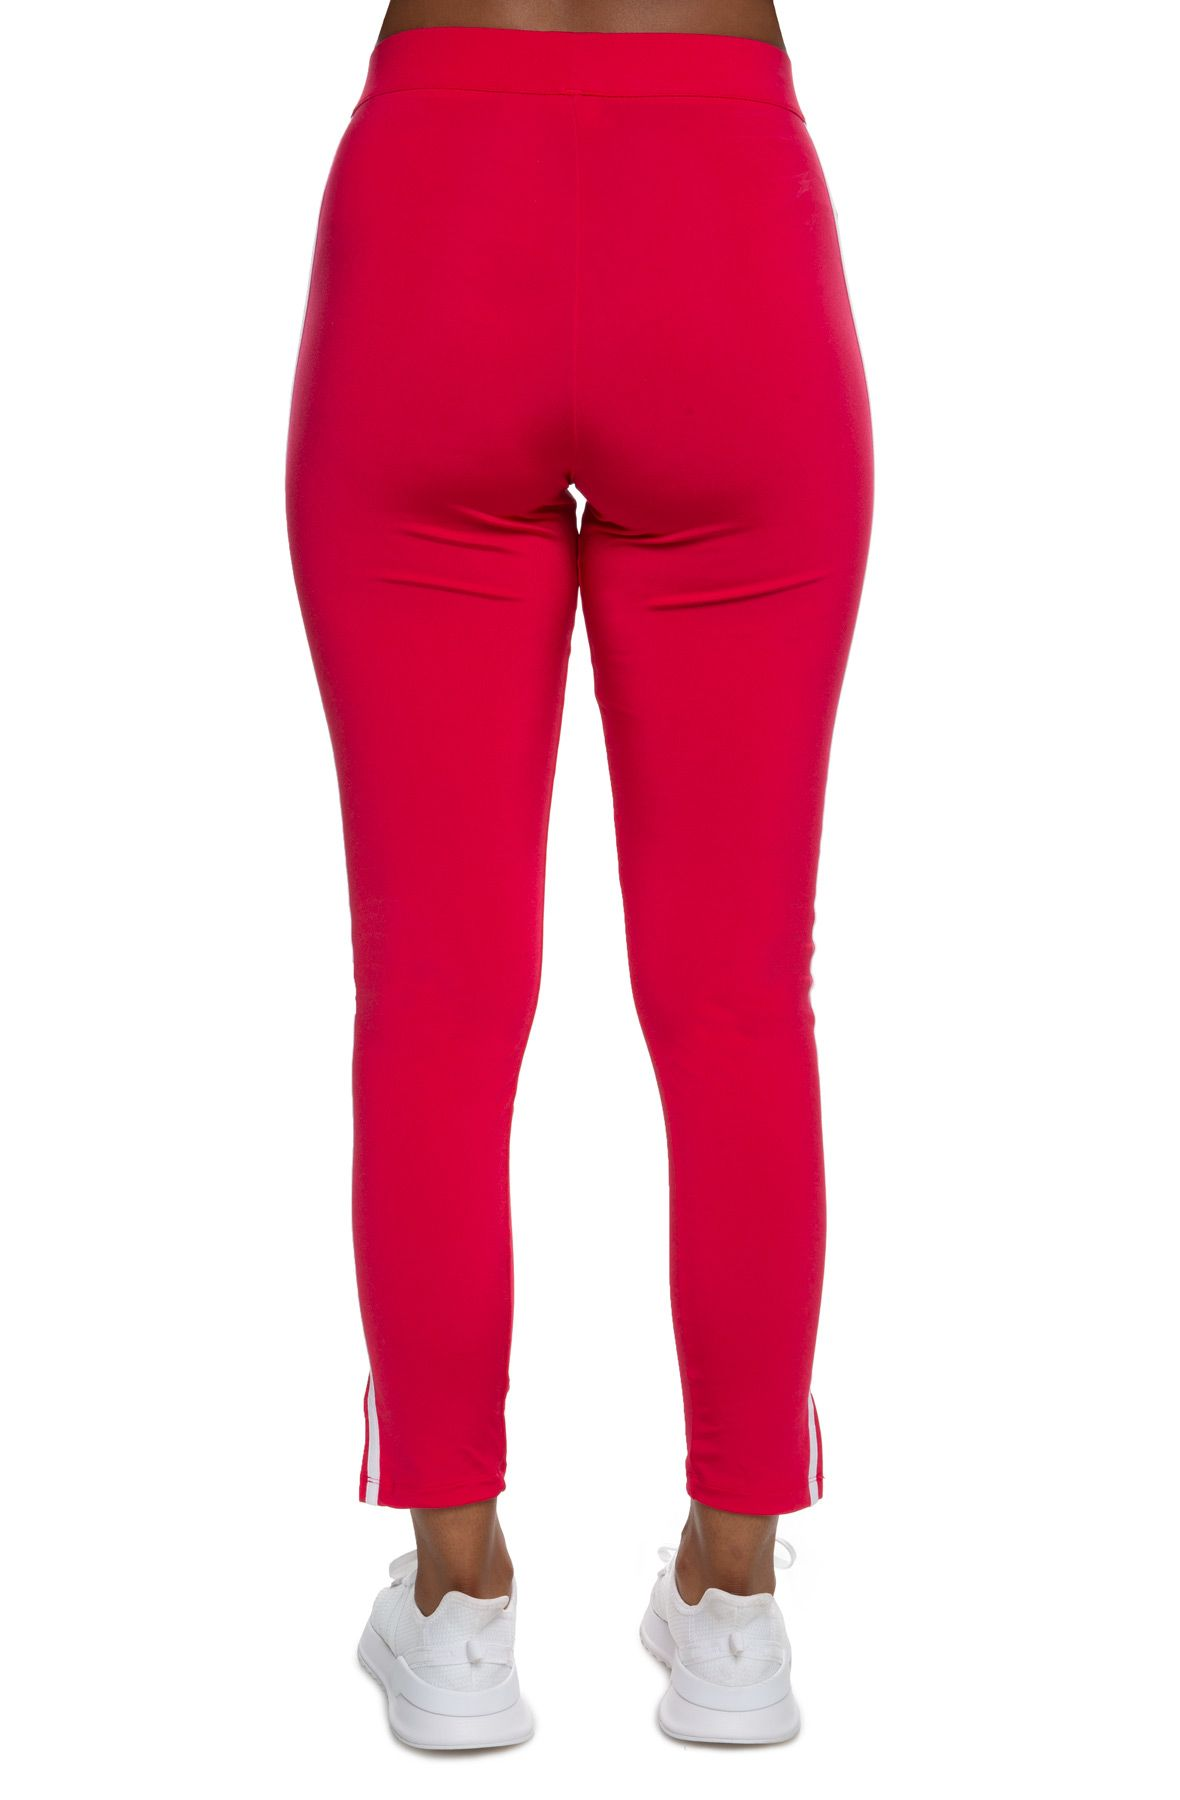 adidas leggings energy pink